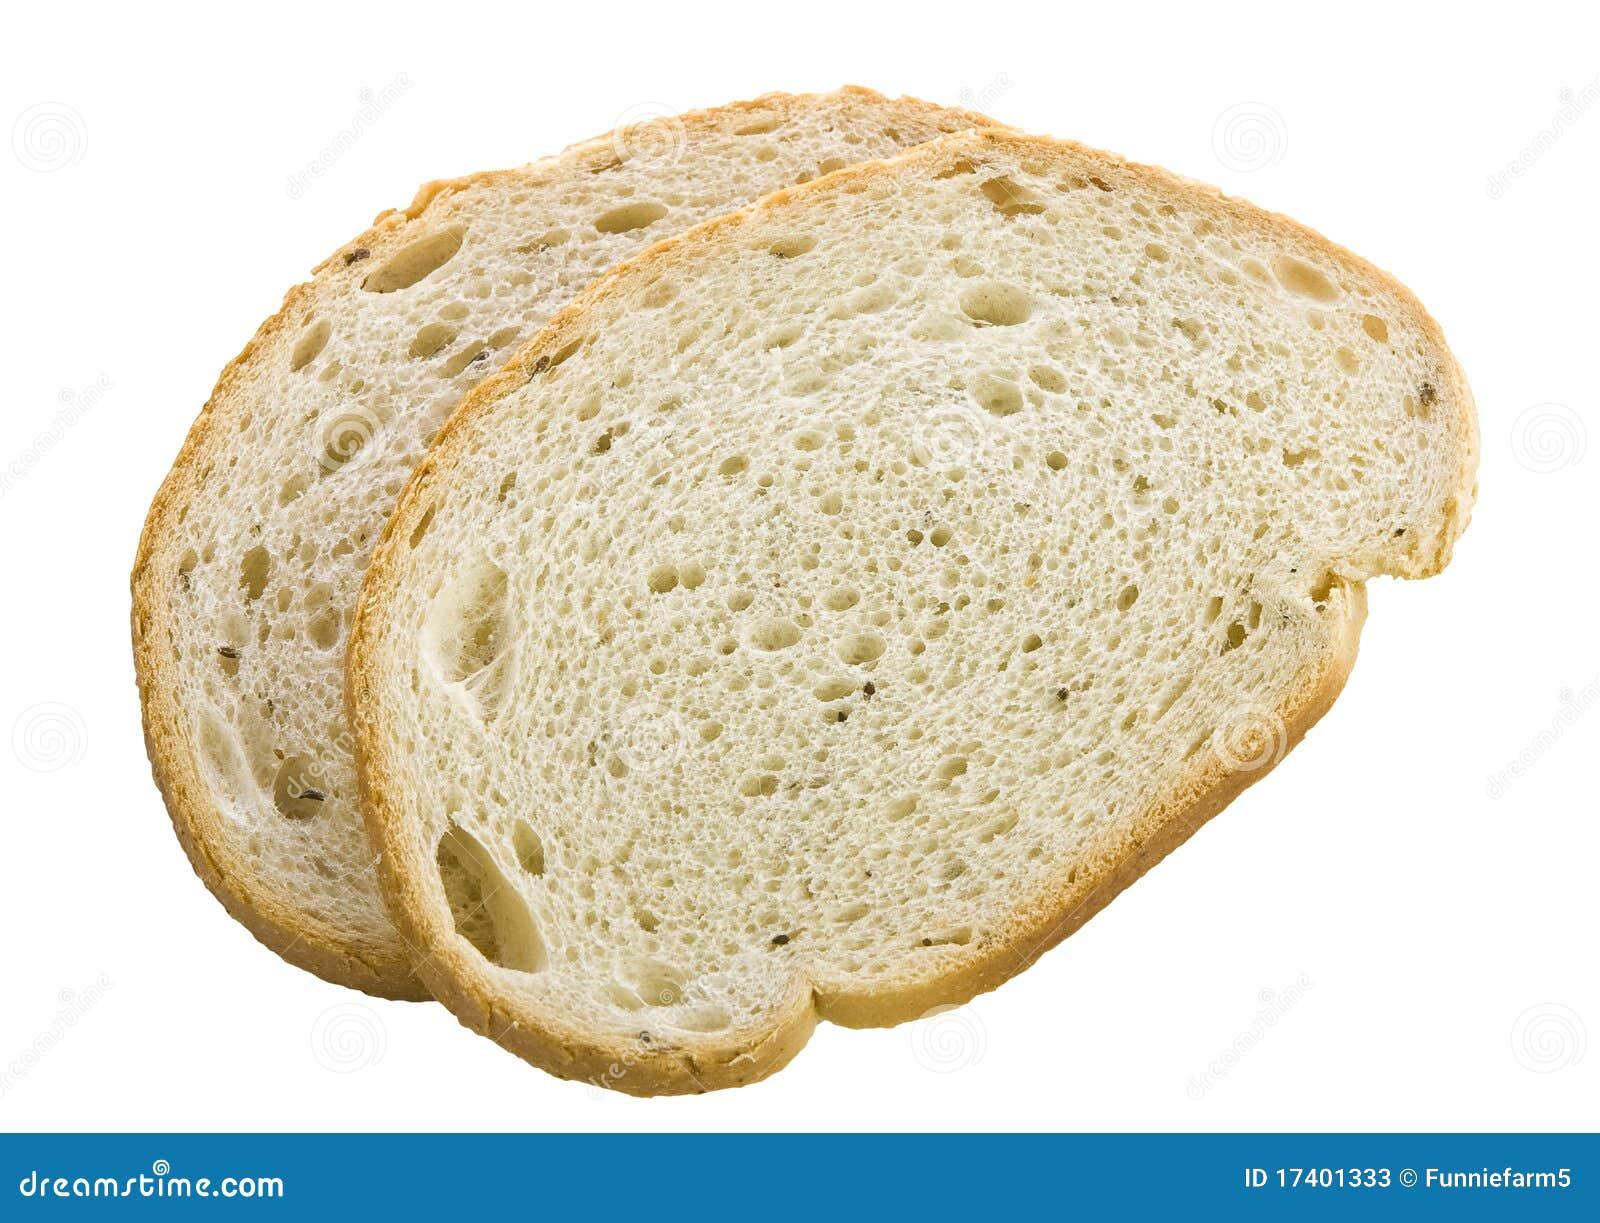 how to make wheat free rye bread